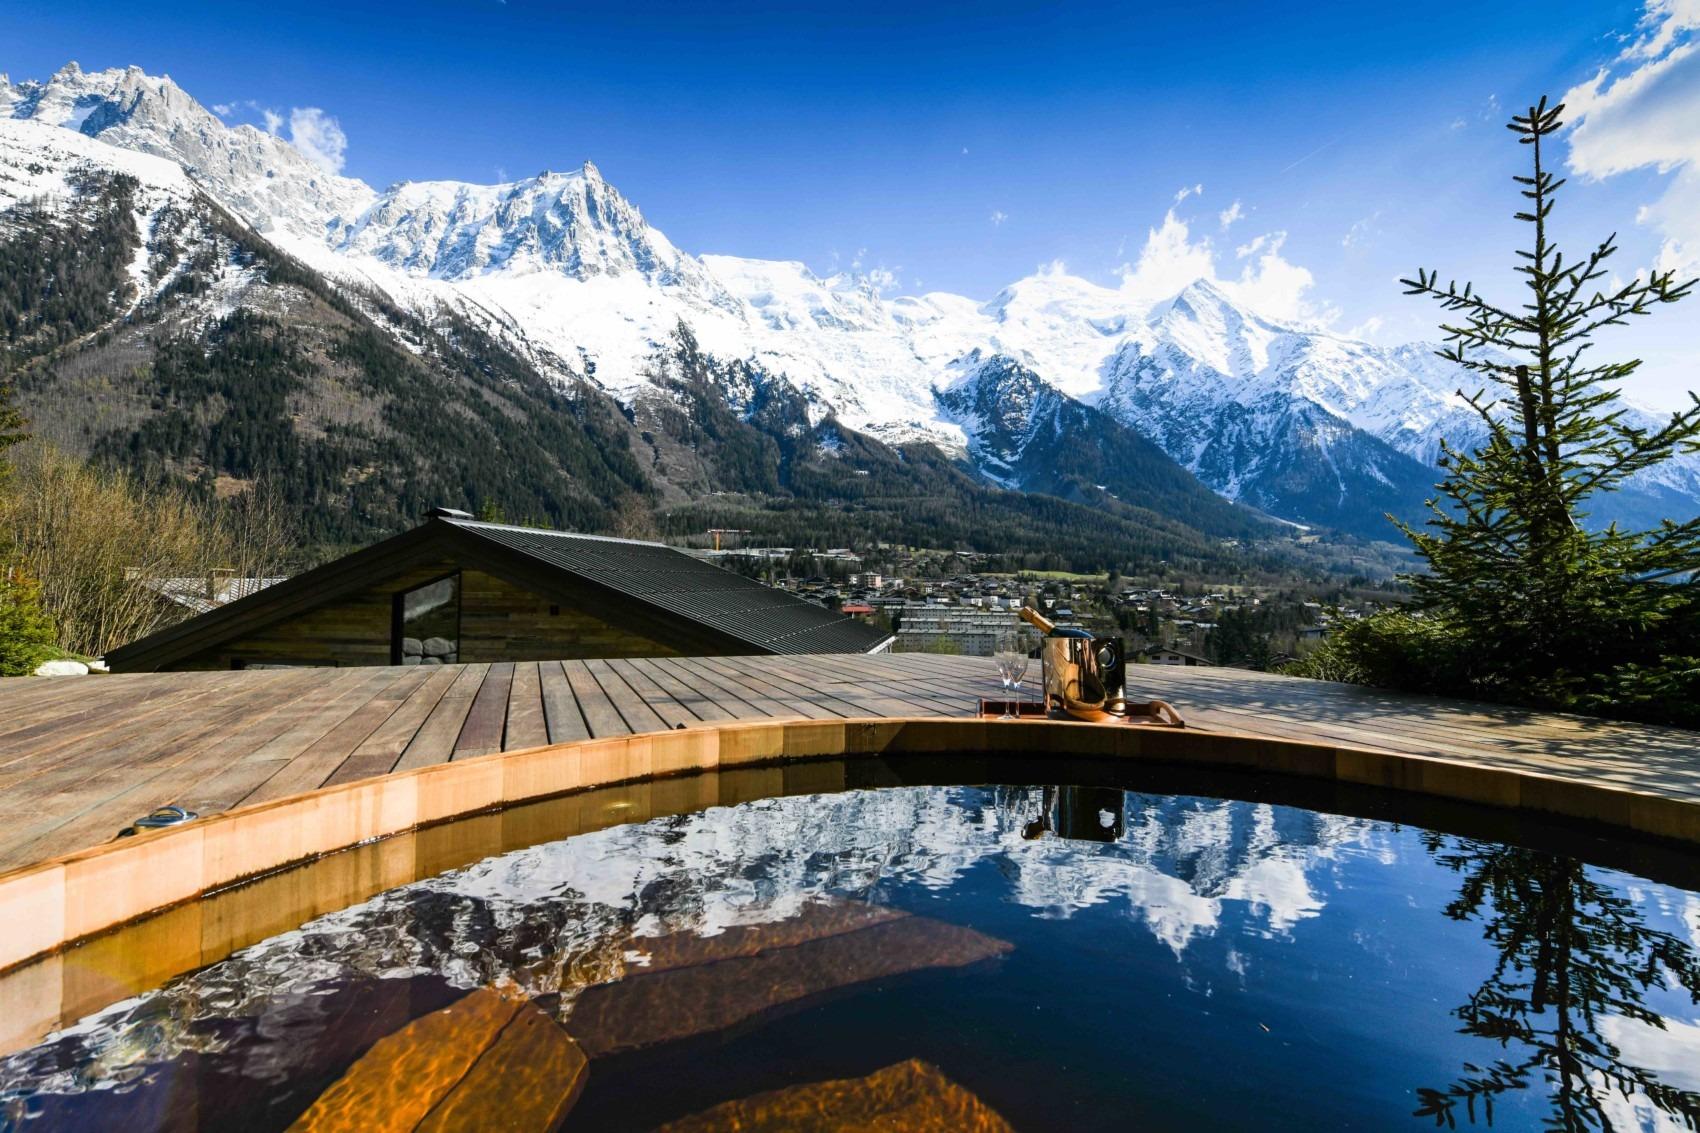 Whirlpool in Chamonix